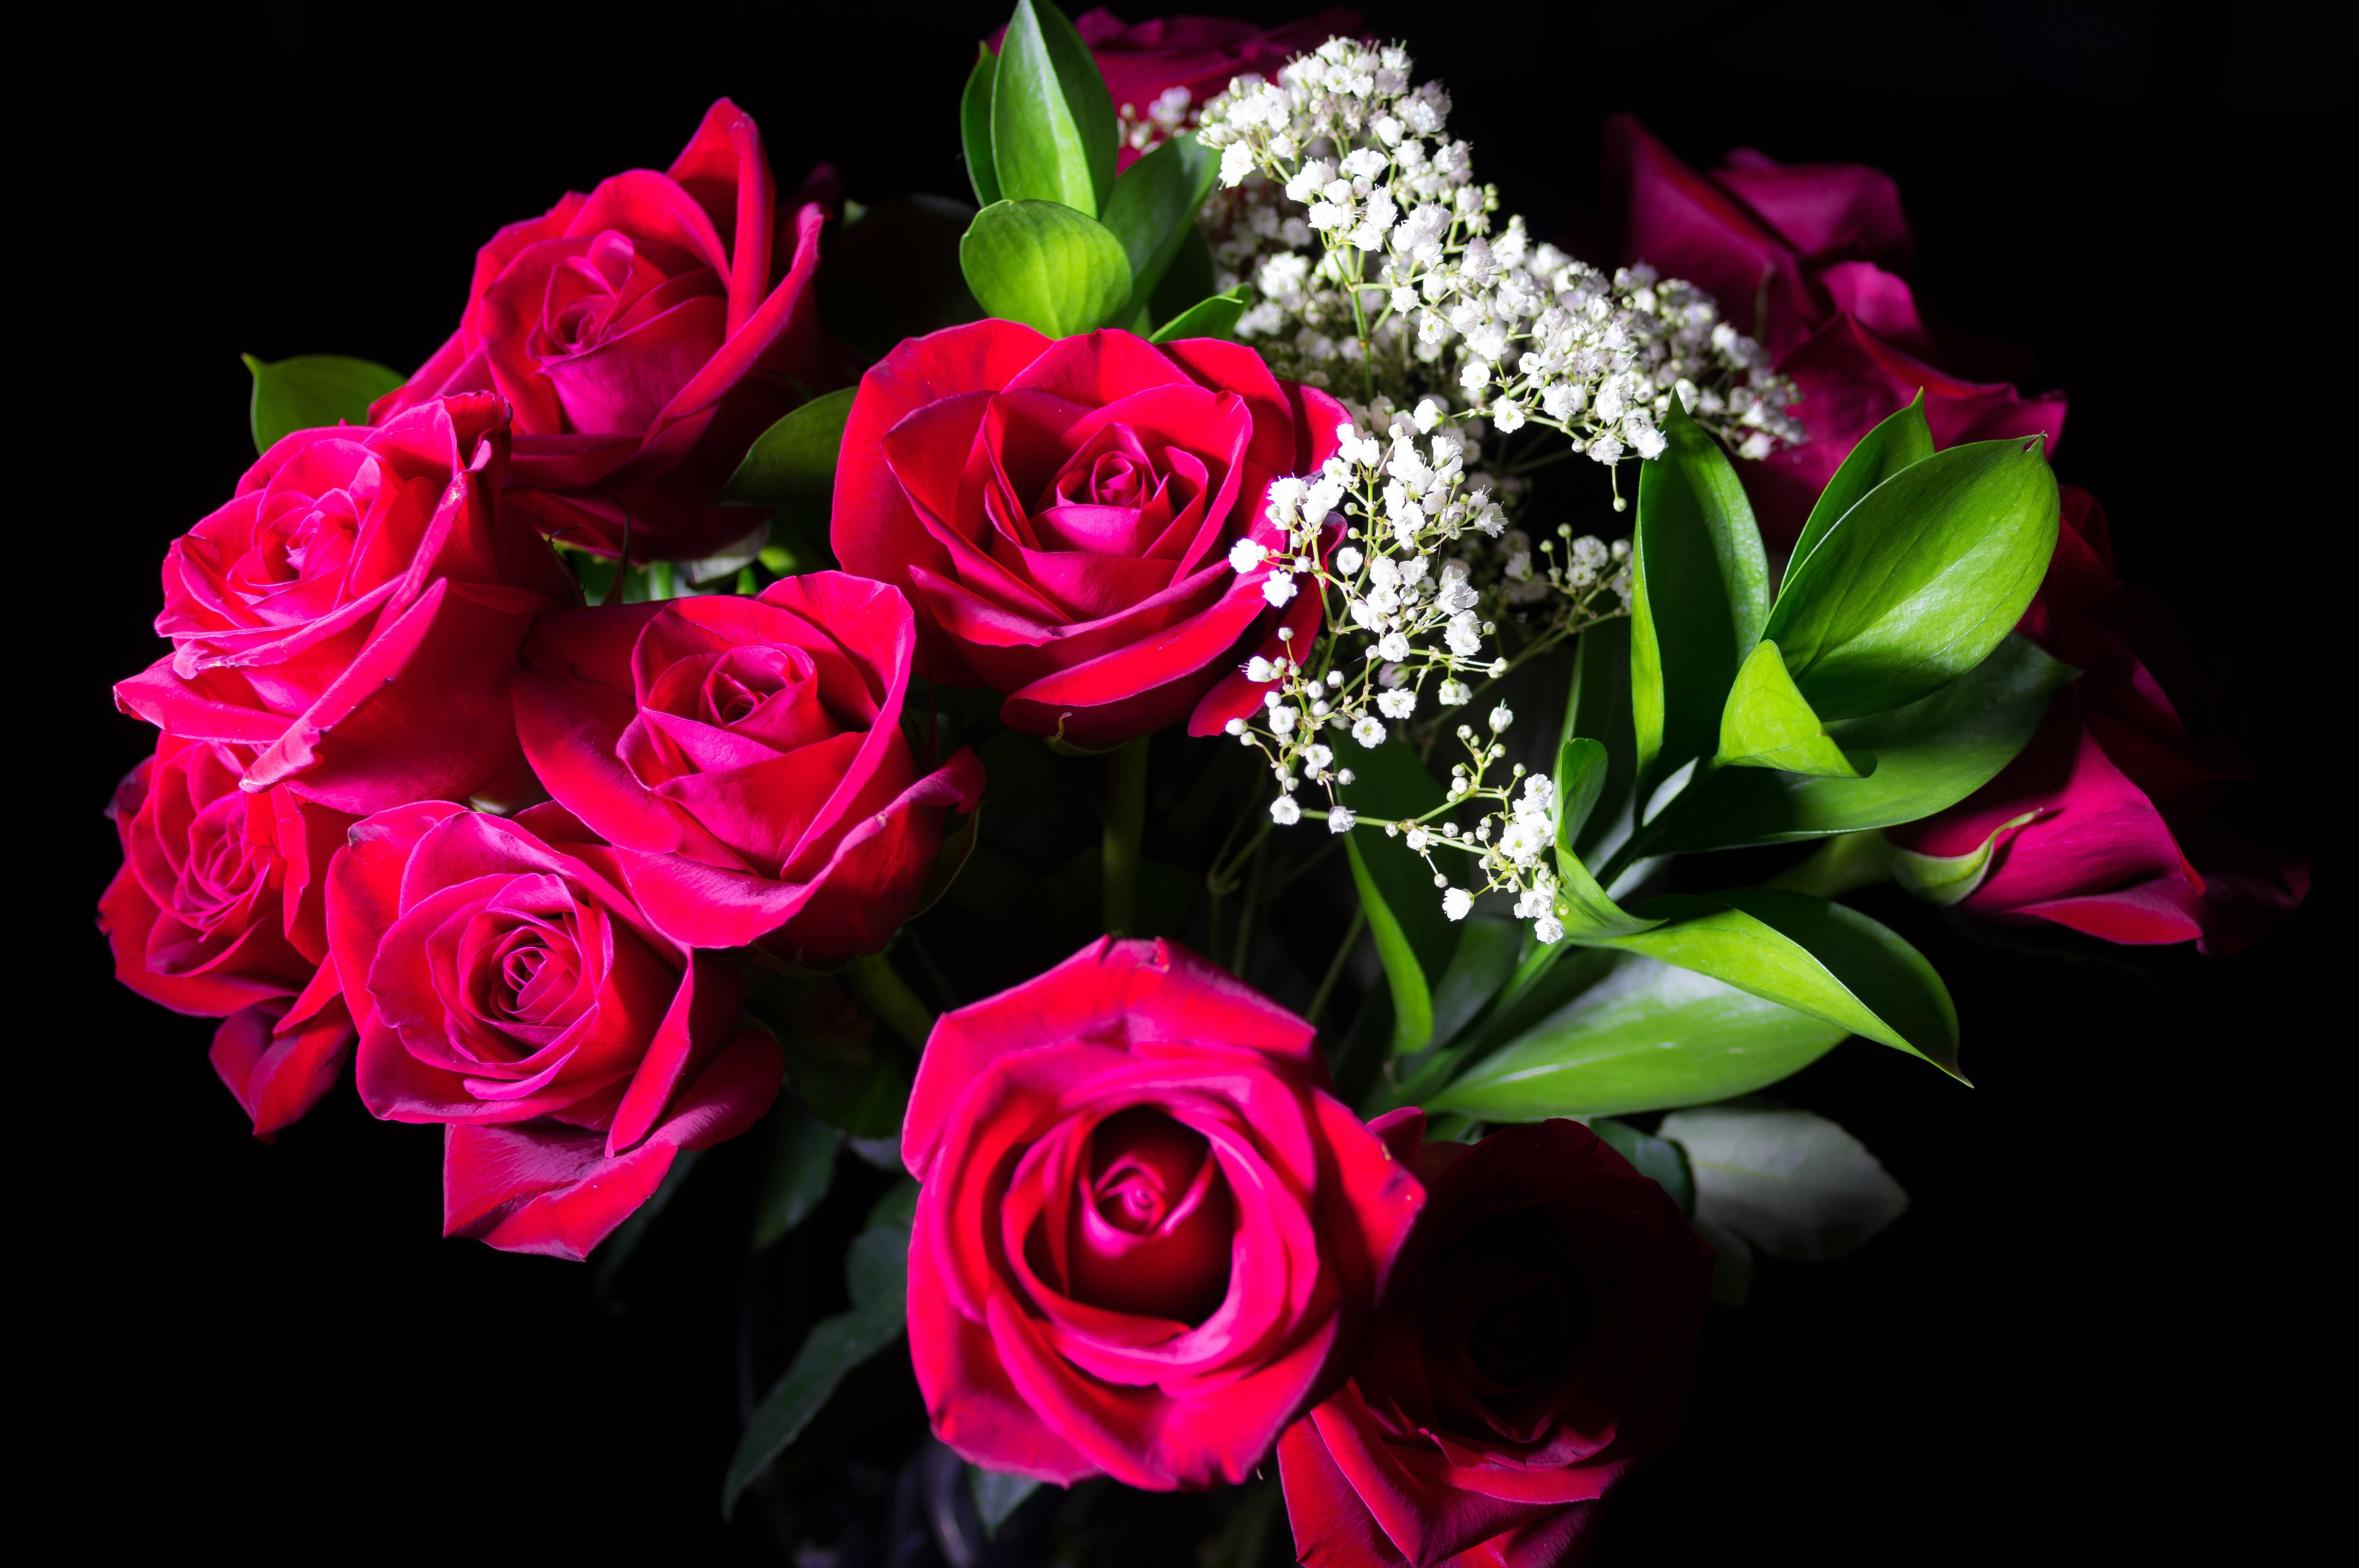 роза, розы, цветы